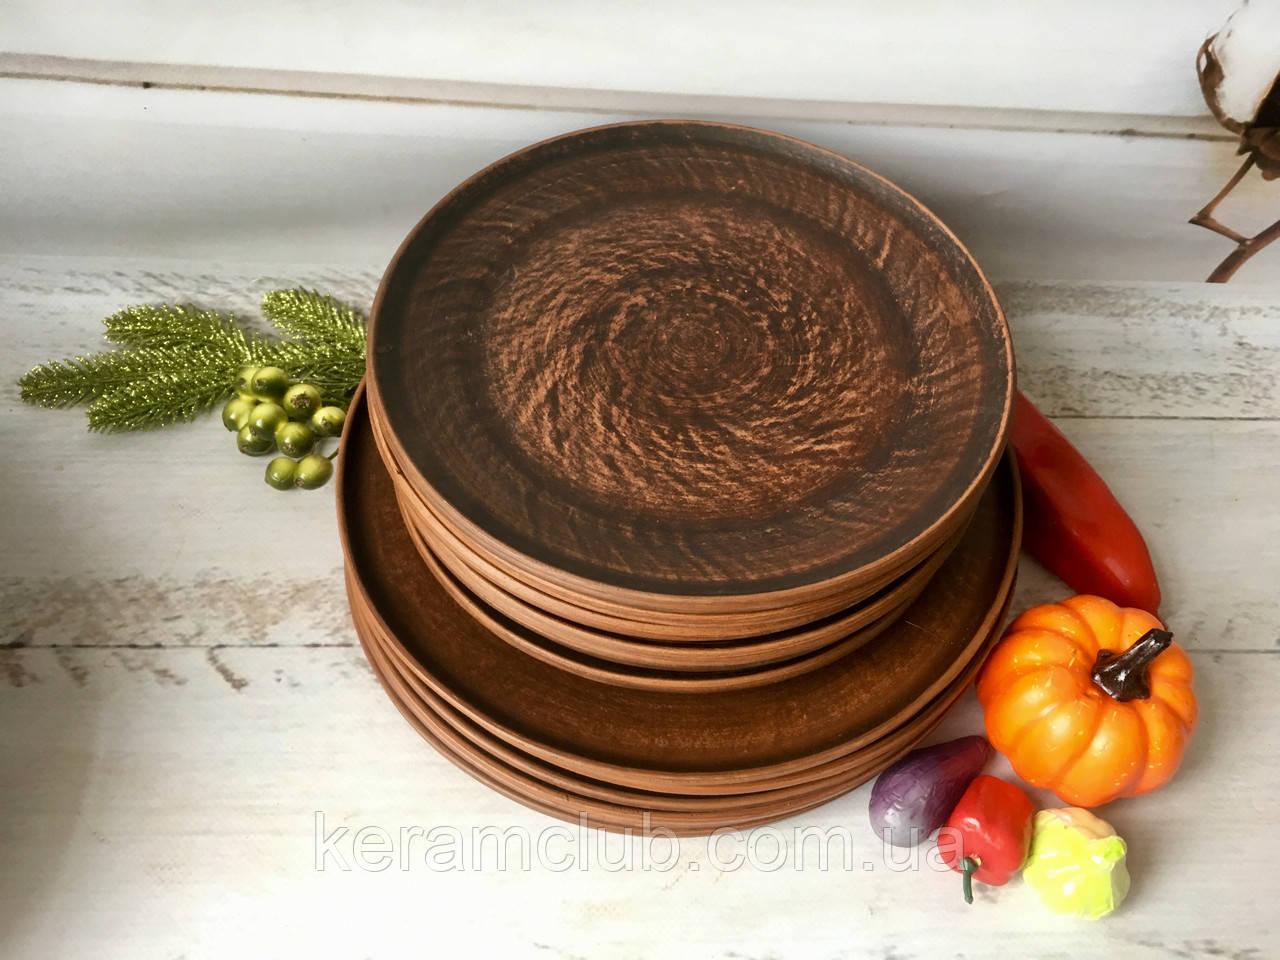 Набор тарелок 6 шт 20 см и 6 шт 25 см